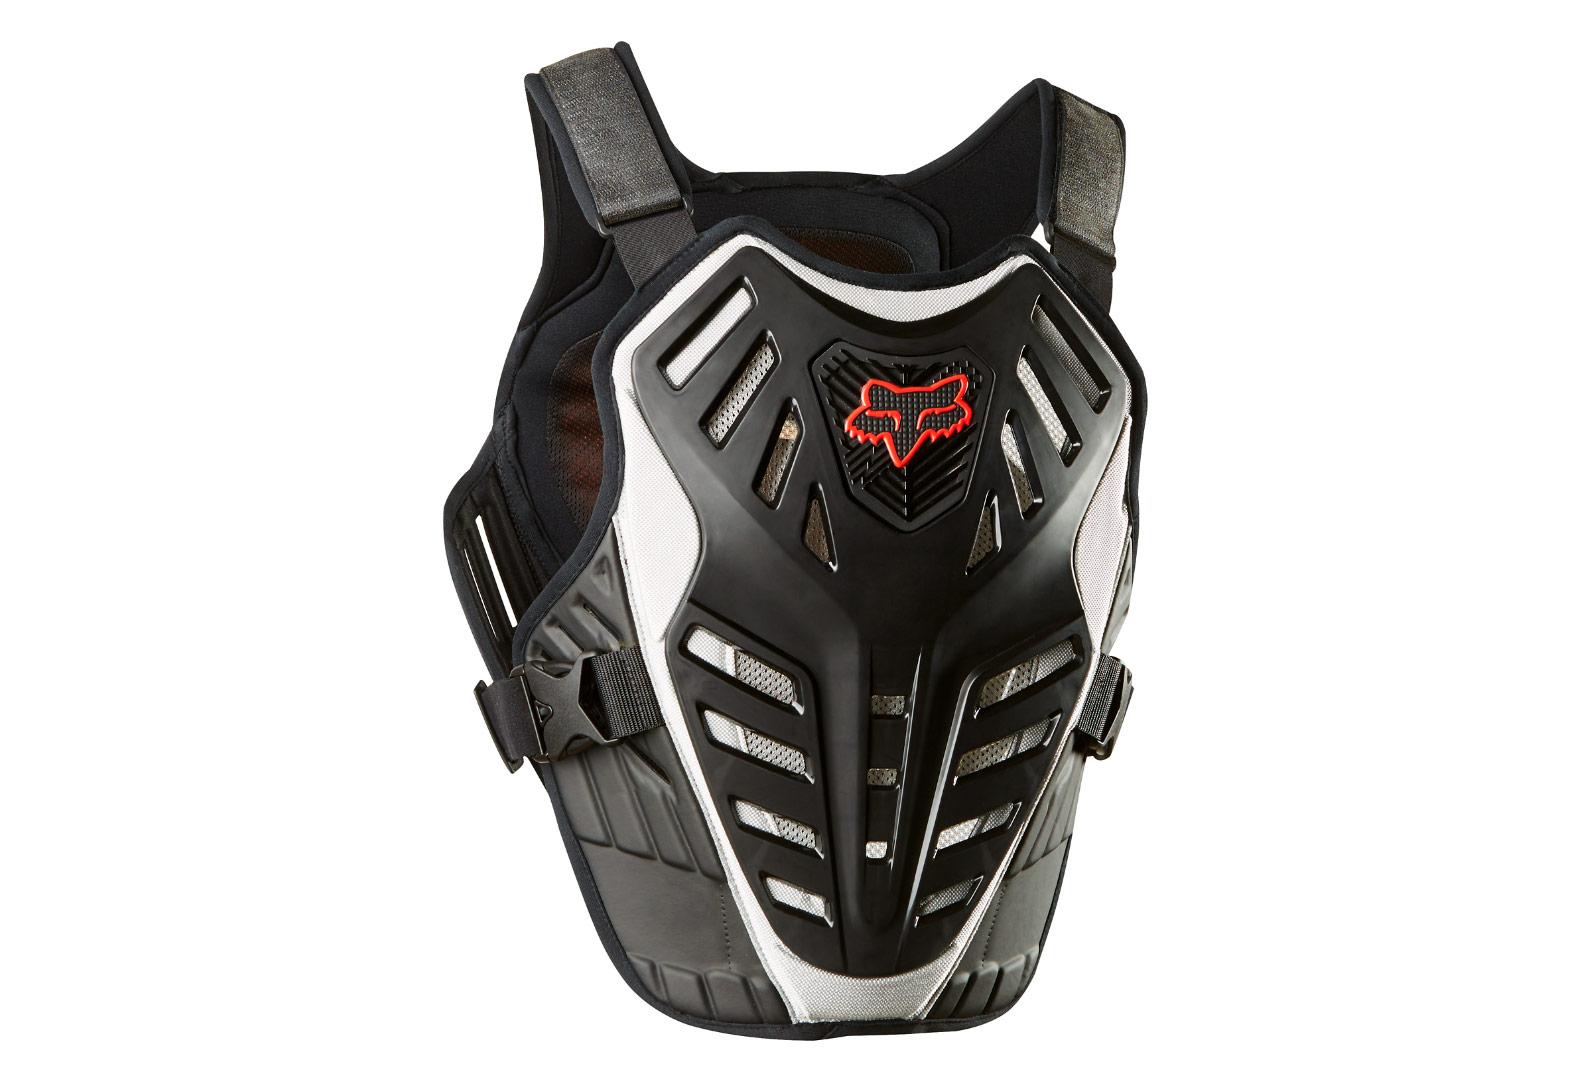 gilet de protection fox titan race subframe noir. Black Bedroom Furniture Sets. Home Design Ideas